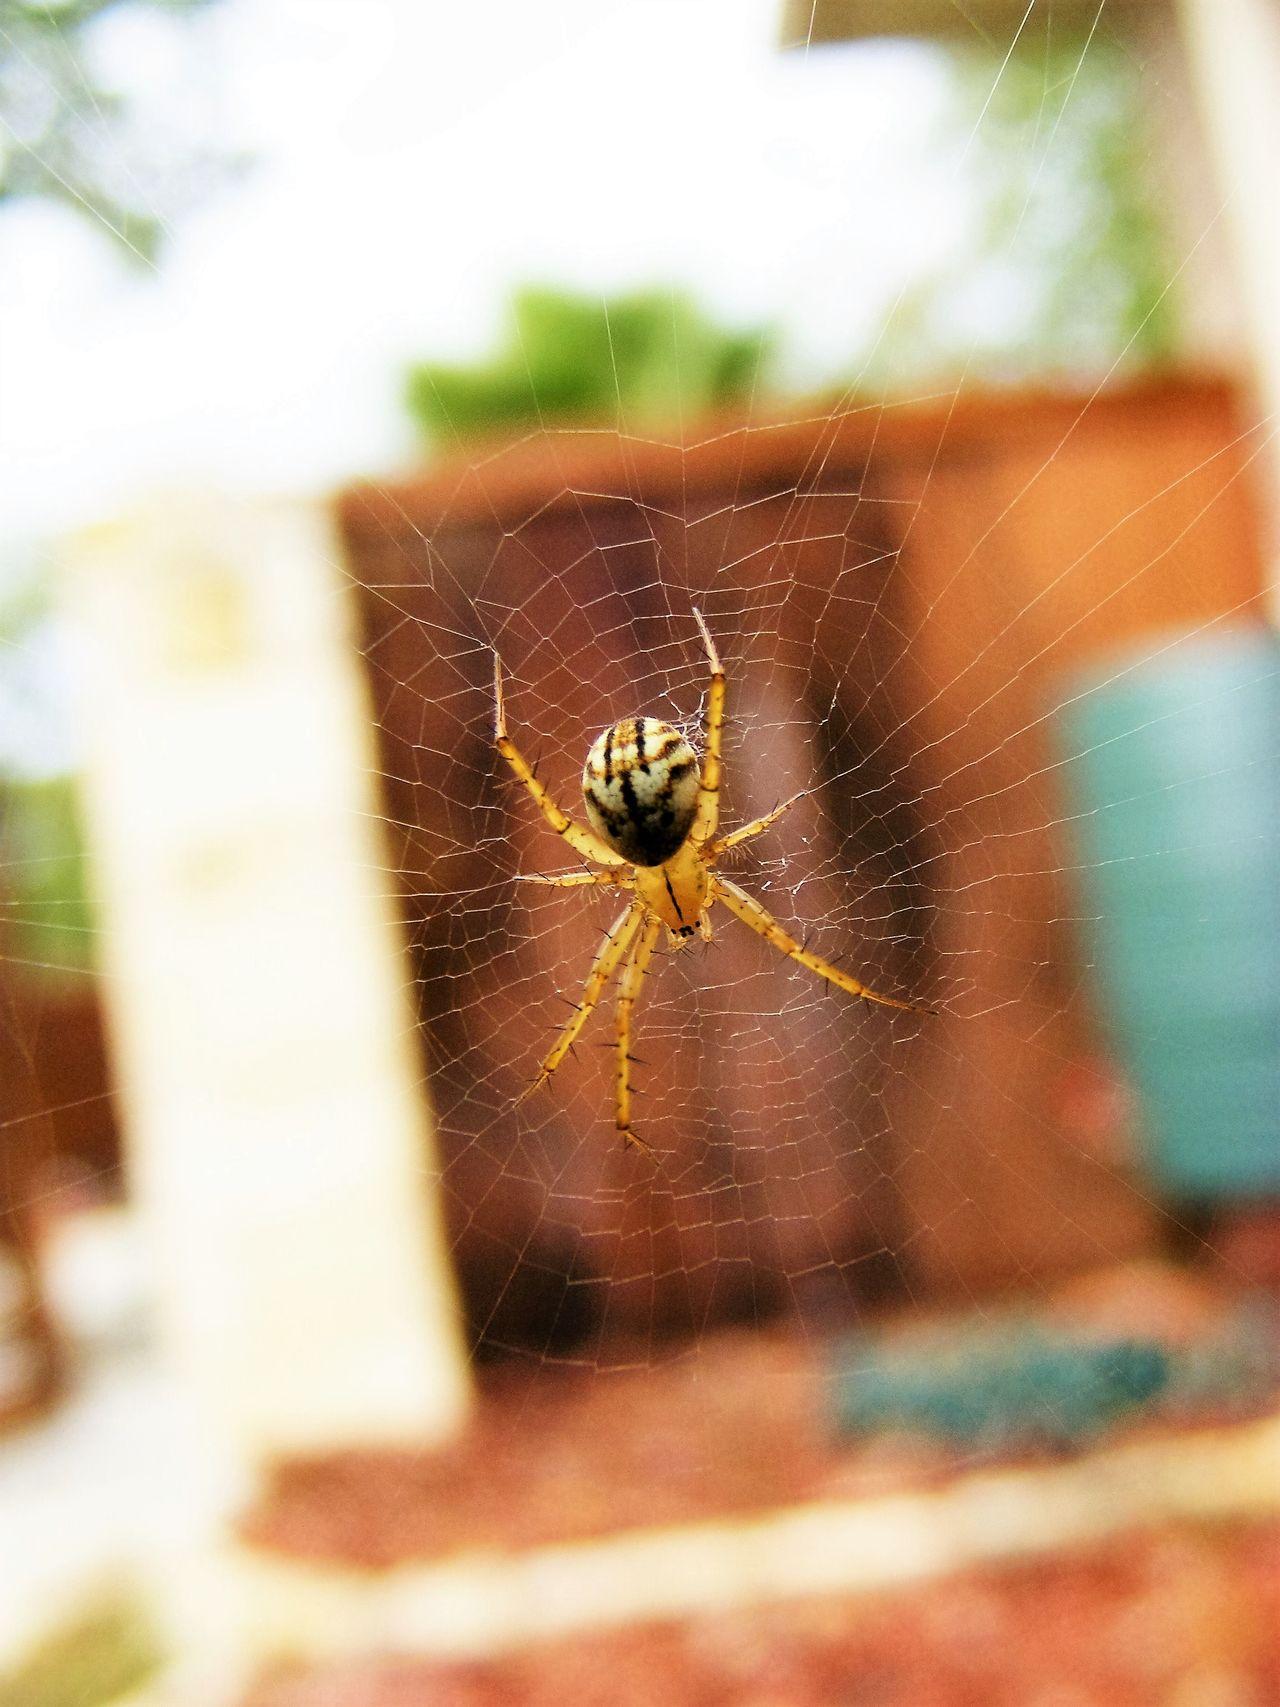 "Very Small Spider 1/2"" Arachnid Photography Arachnid_perfection Arachnophobia Beauty In Nature Focus On Foreground Spider Spider Nature_collection Eyenaturelover Spider Web Spiderweb Spiderworld"